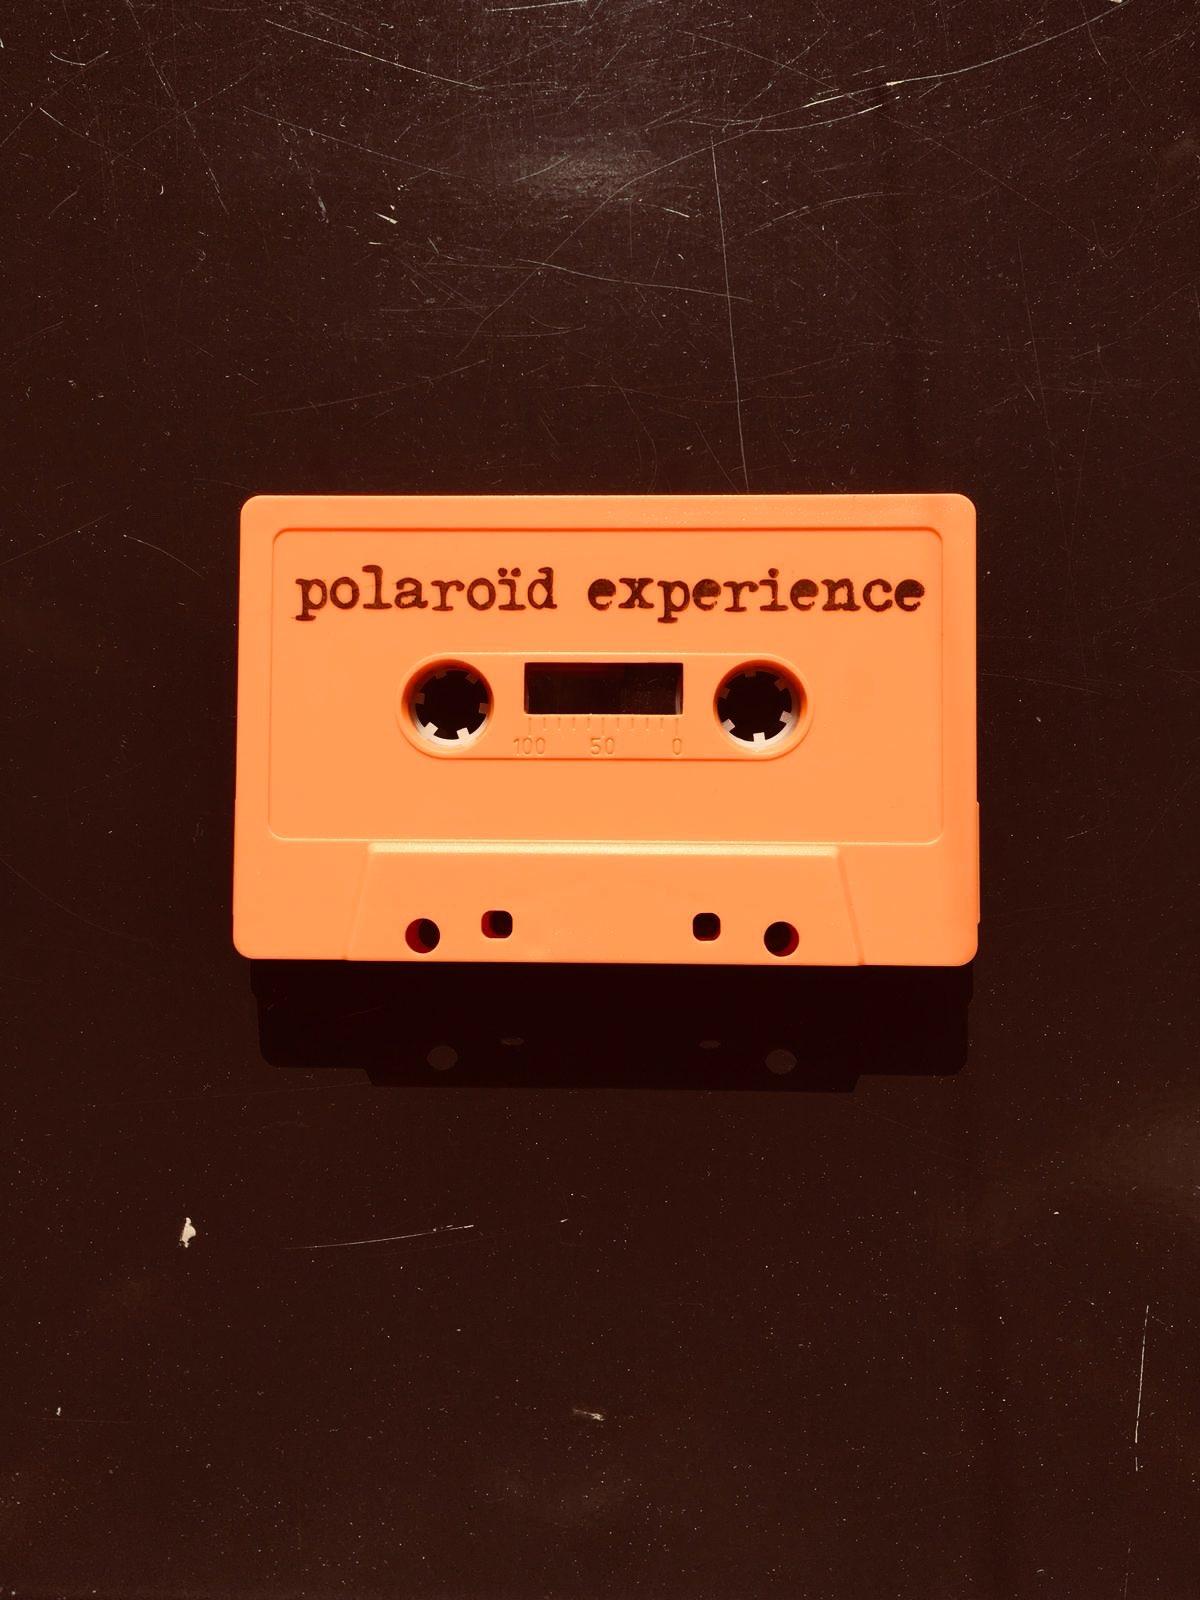 TÉLÉCHARGER POLAROID EXPERIENCE YOUSSOUPHA